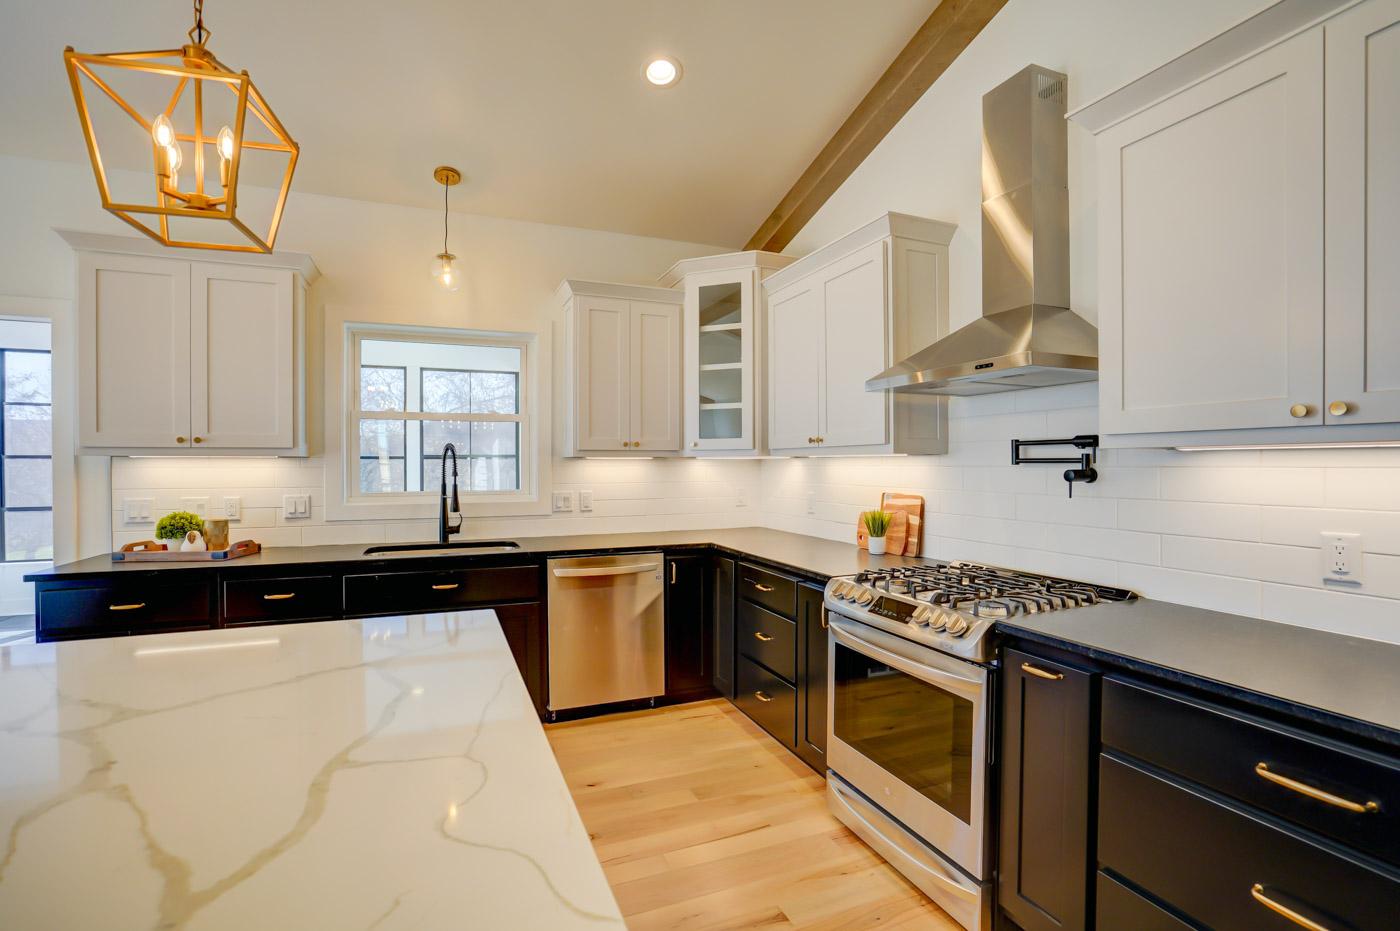 November Home Maintenance Checklist | The Huemmer Home Team | RE/MAX